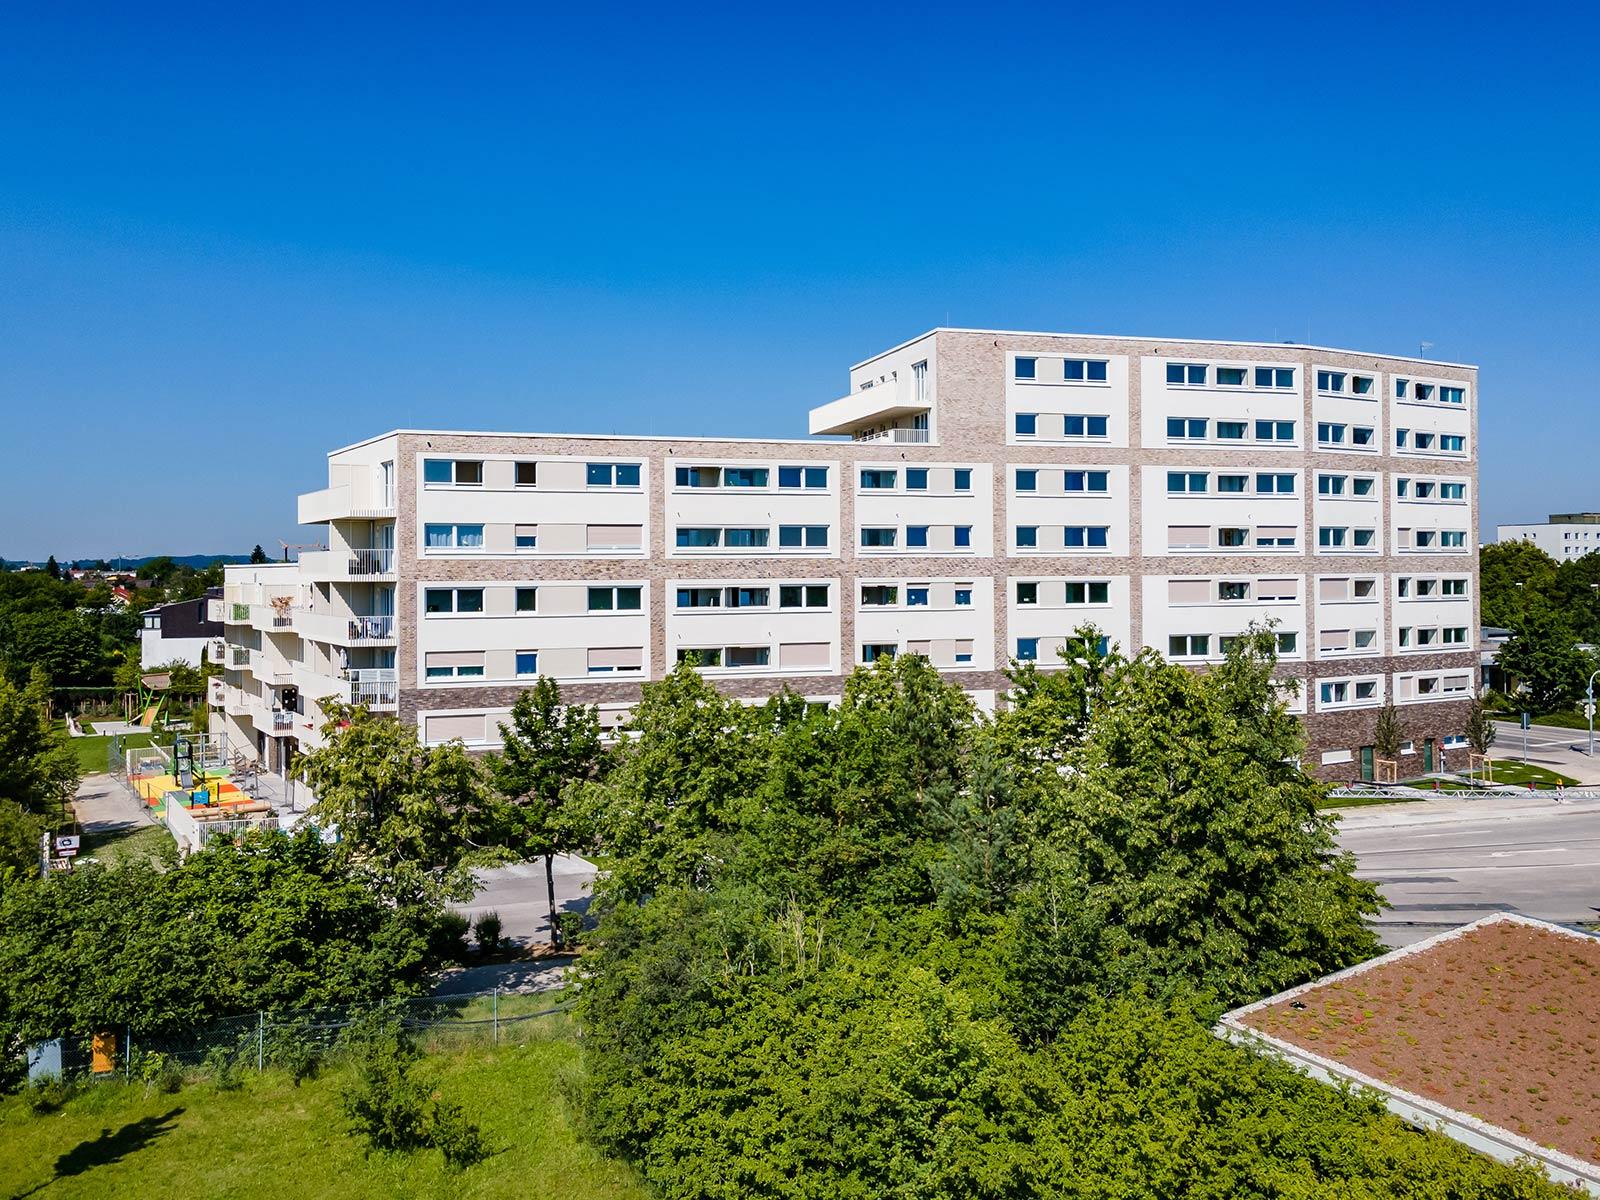 Neubau Germering Conceptbau web4 1